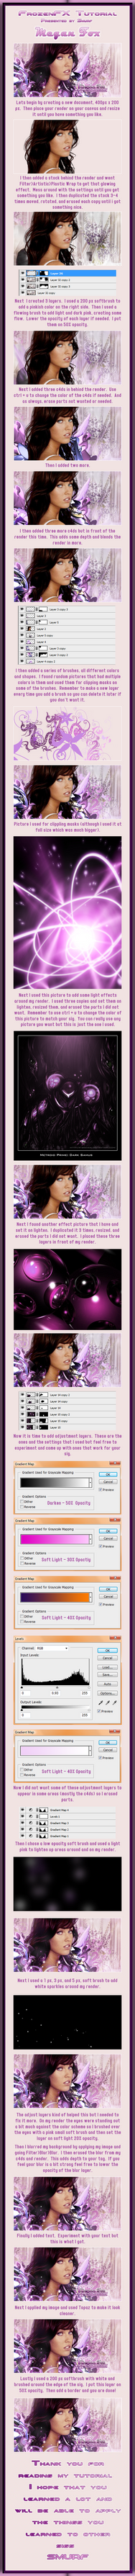 Megan Fox Tutorial by GfxSmurf